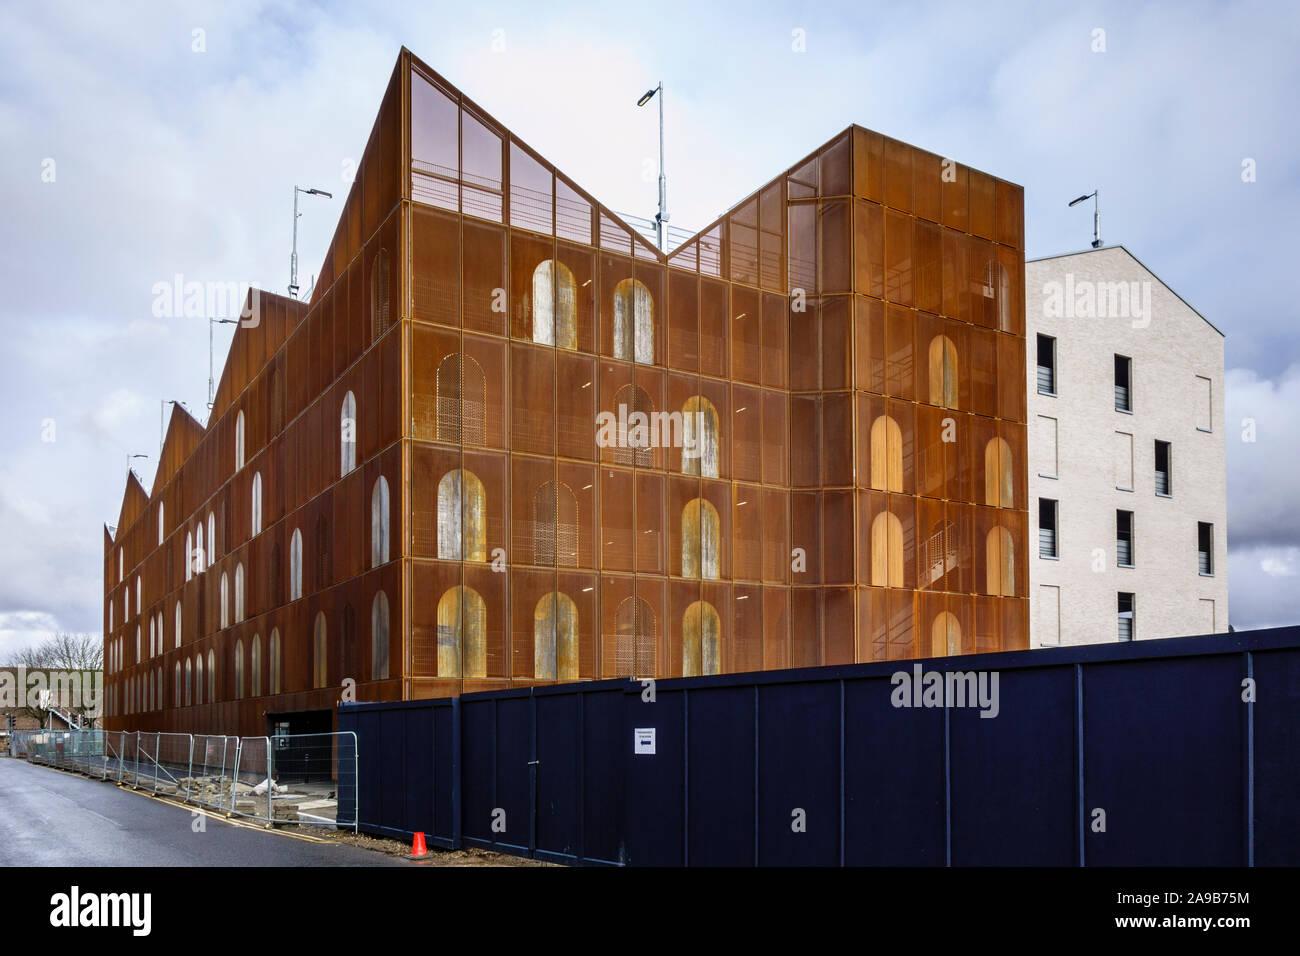 The Goods Yard development 401-space multi-storey car park, building site in Bishops Stortford Town Centre High Street, Hertfordshire, England, UK, GB Stock Photo